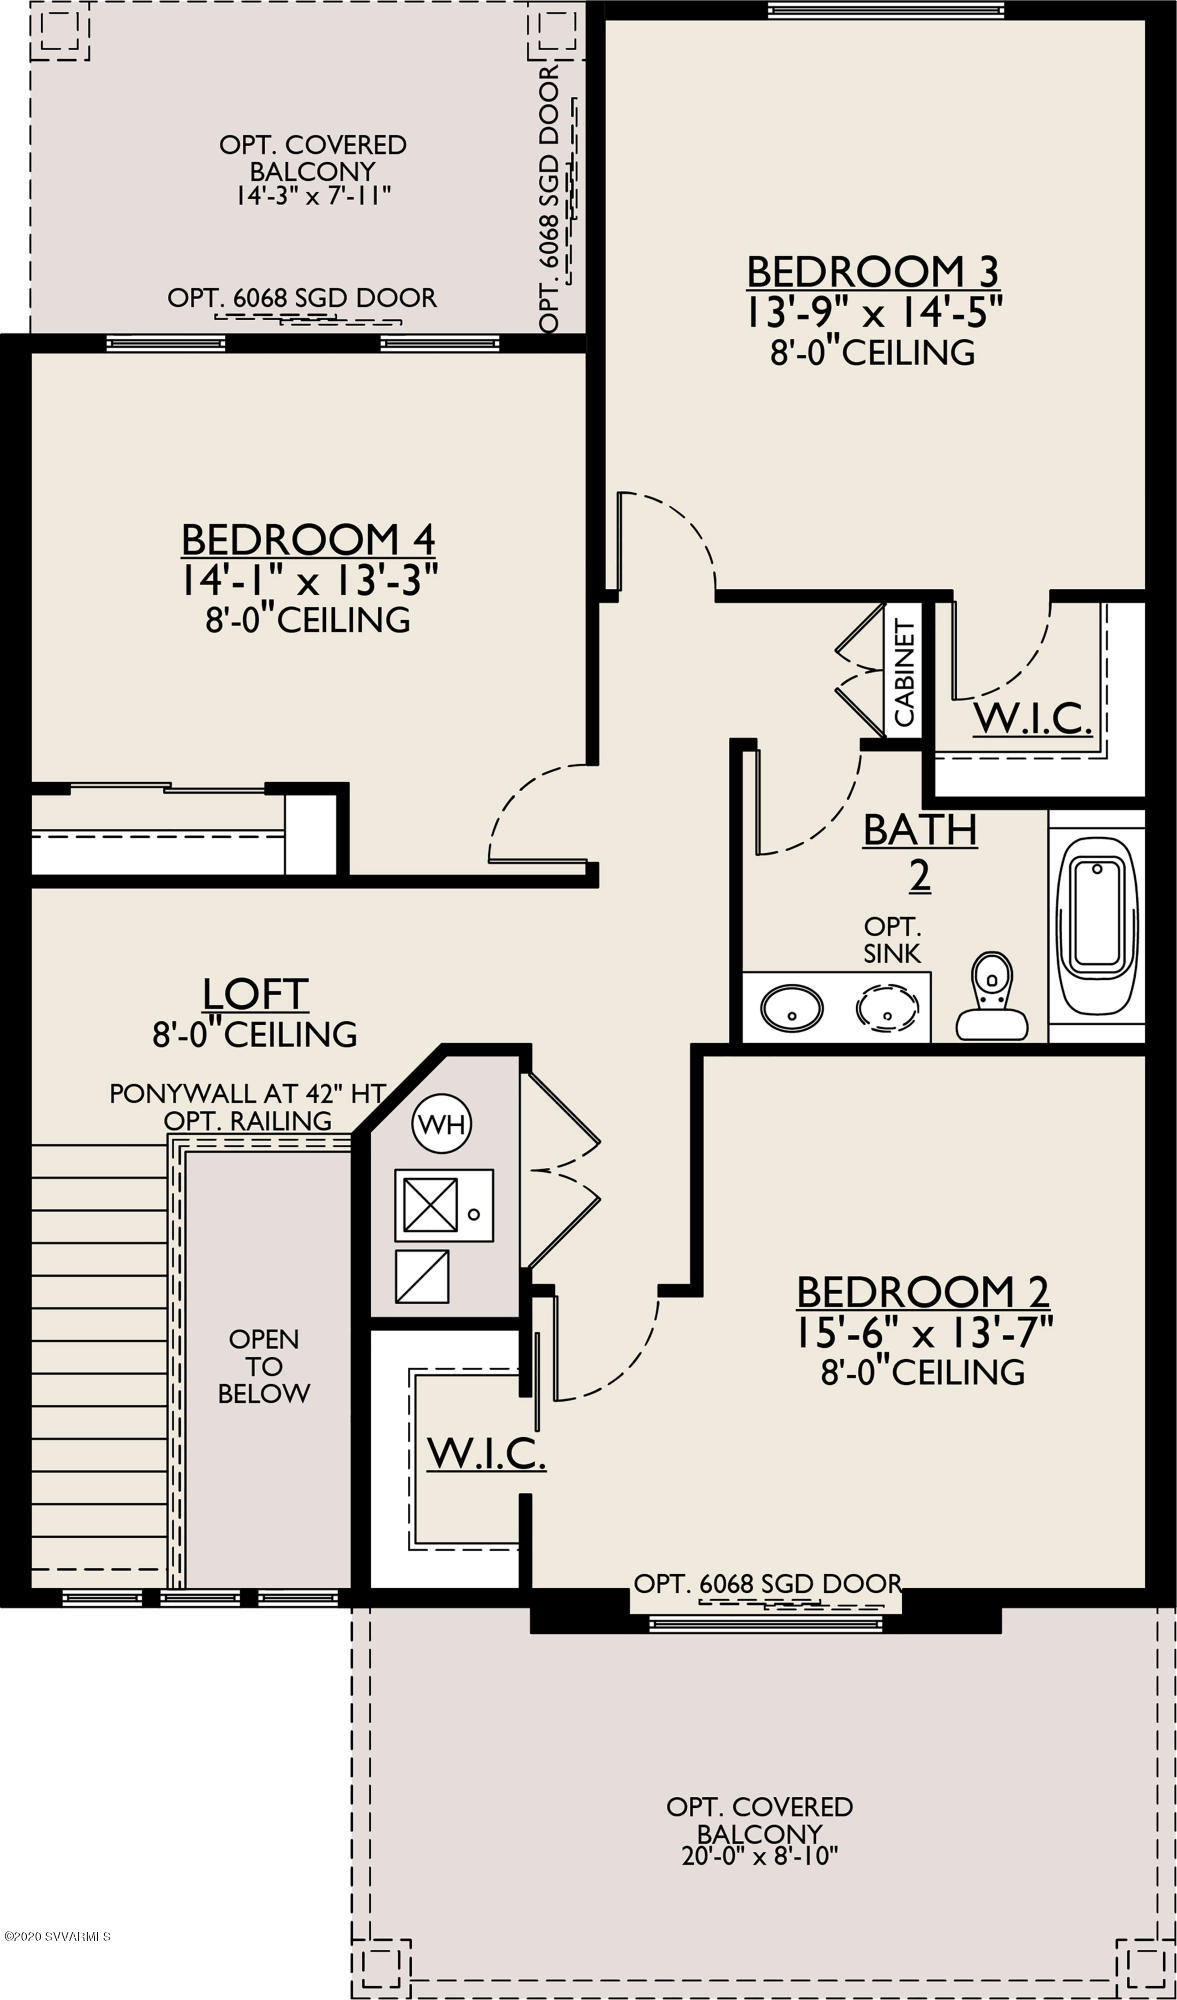 3921 Positano Place Sedona, AZ 86336